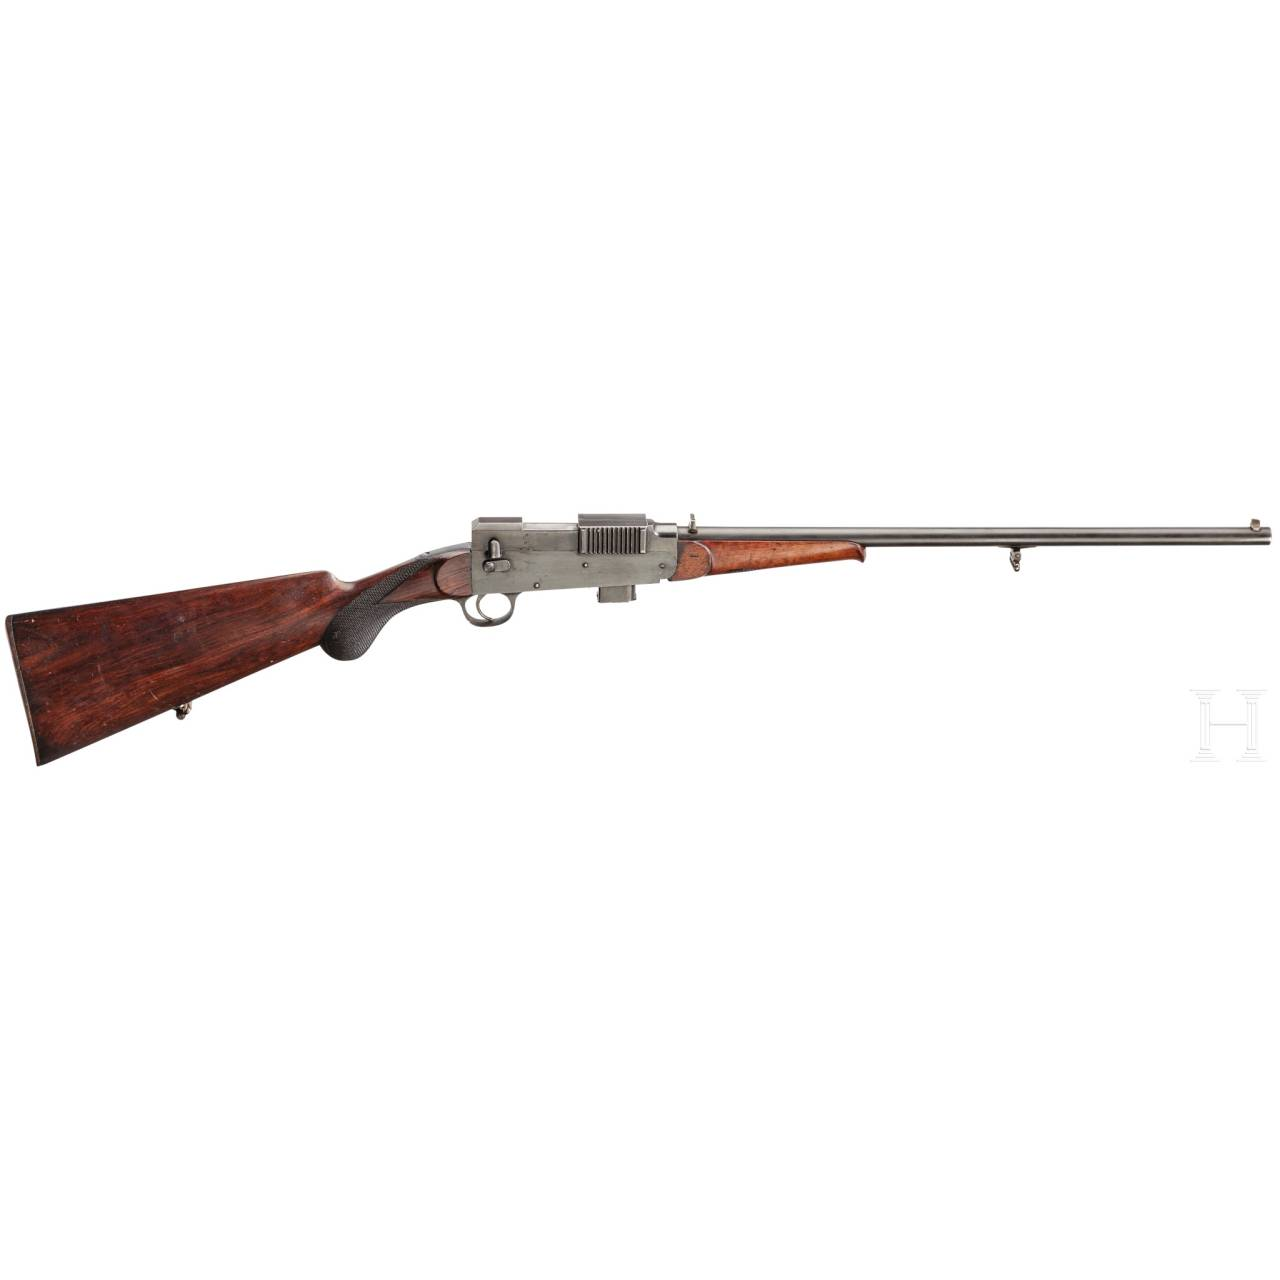 A Dreyse semi-auto carbine M 07